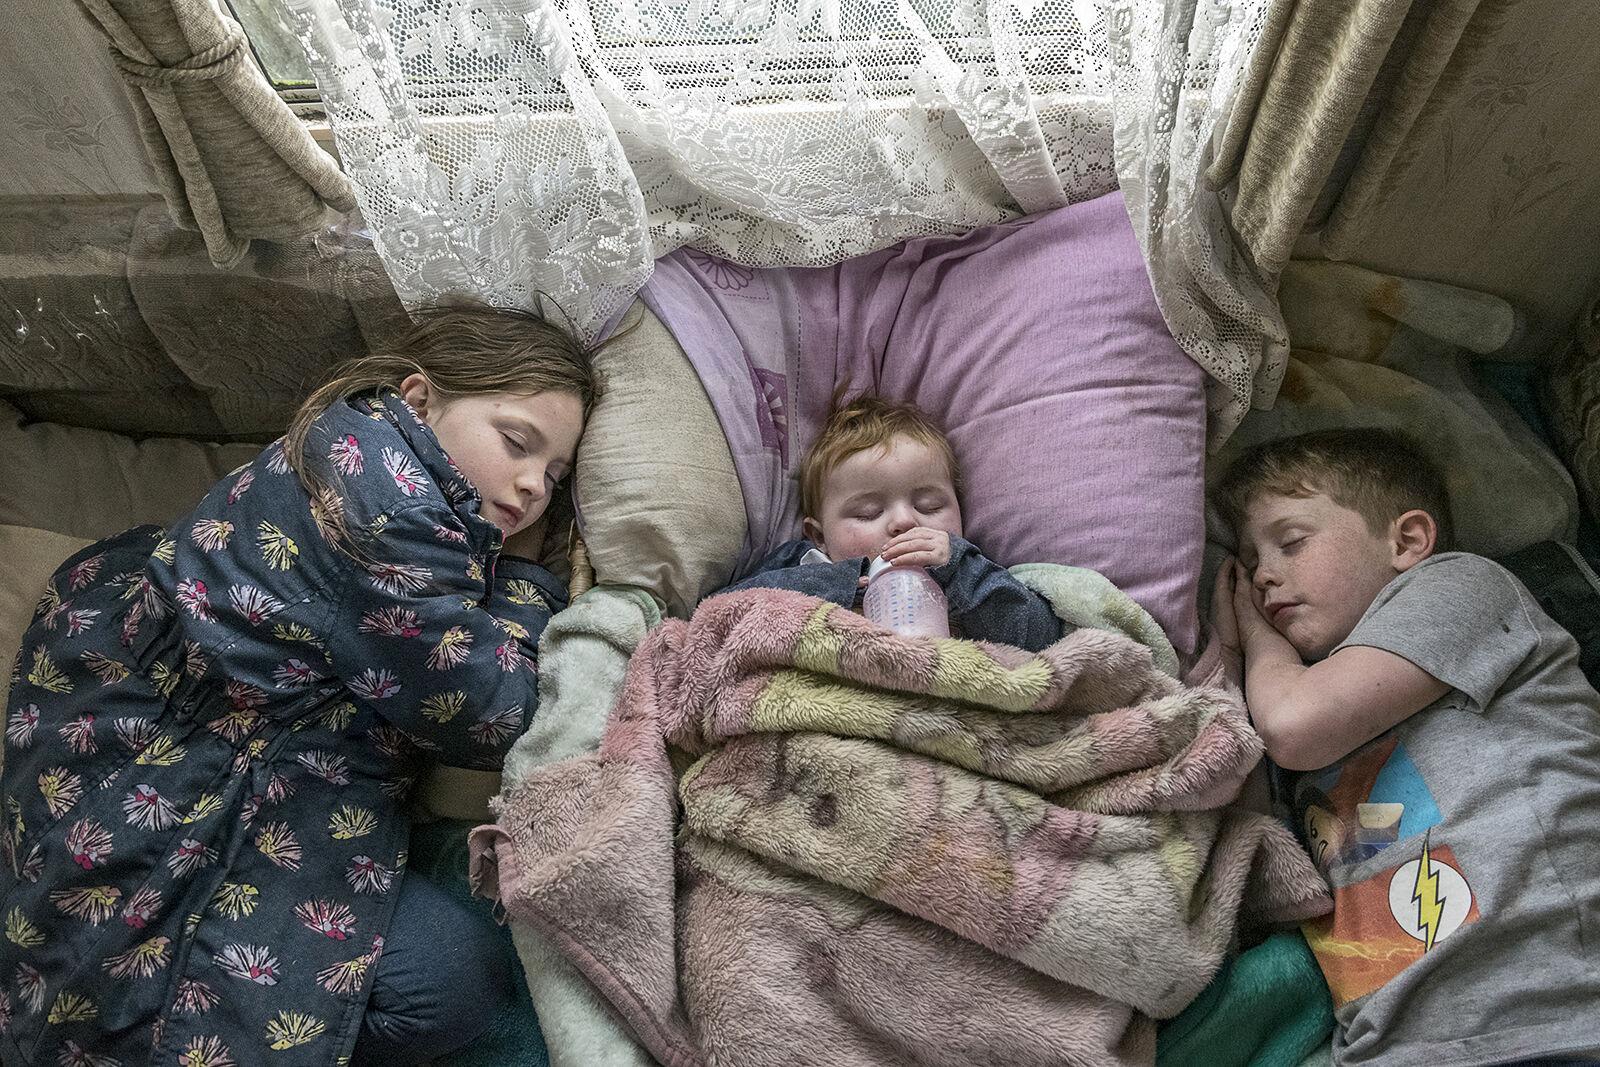 Naptime in Reilly's Caravan, roadside campsite, Tipperary, Ireland 2019